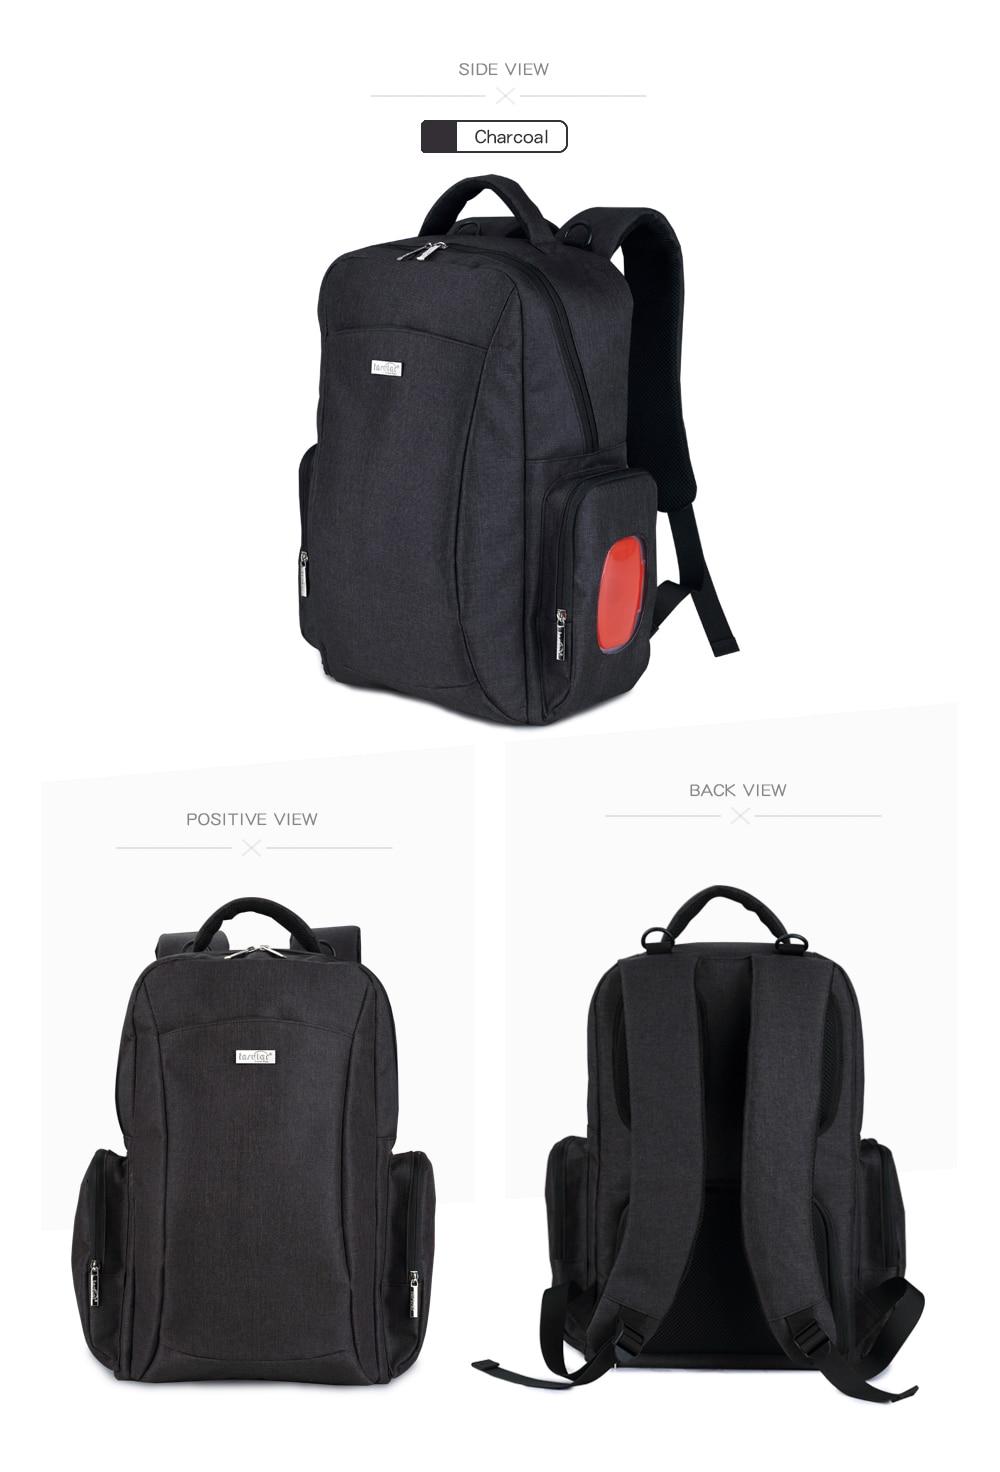 baby diaper backpack10026 (23)